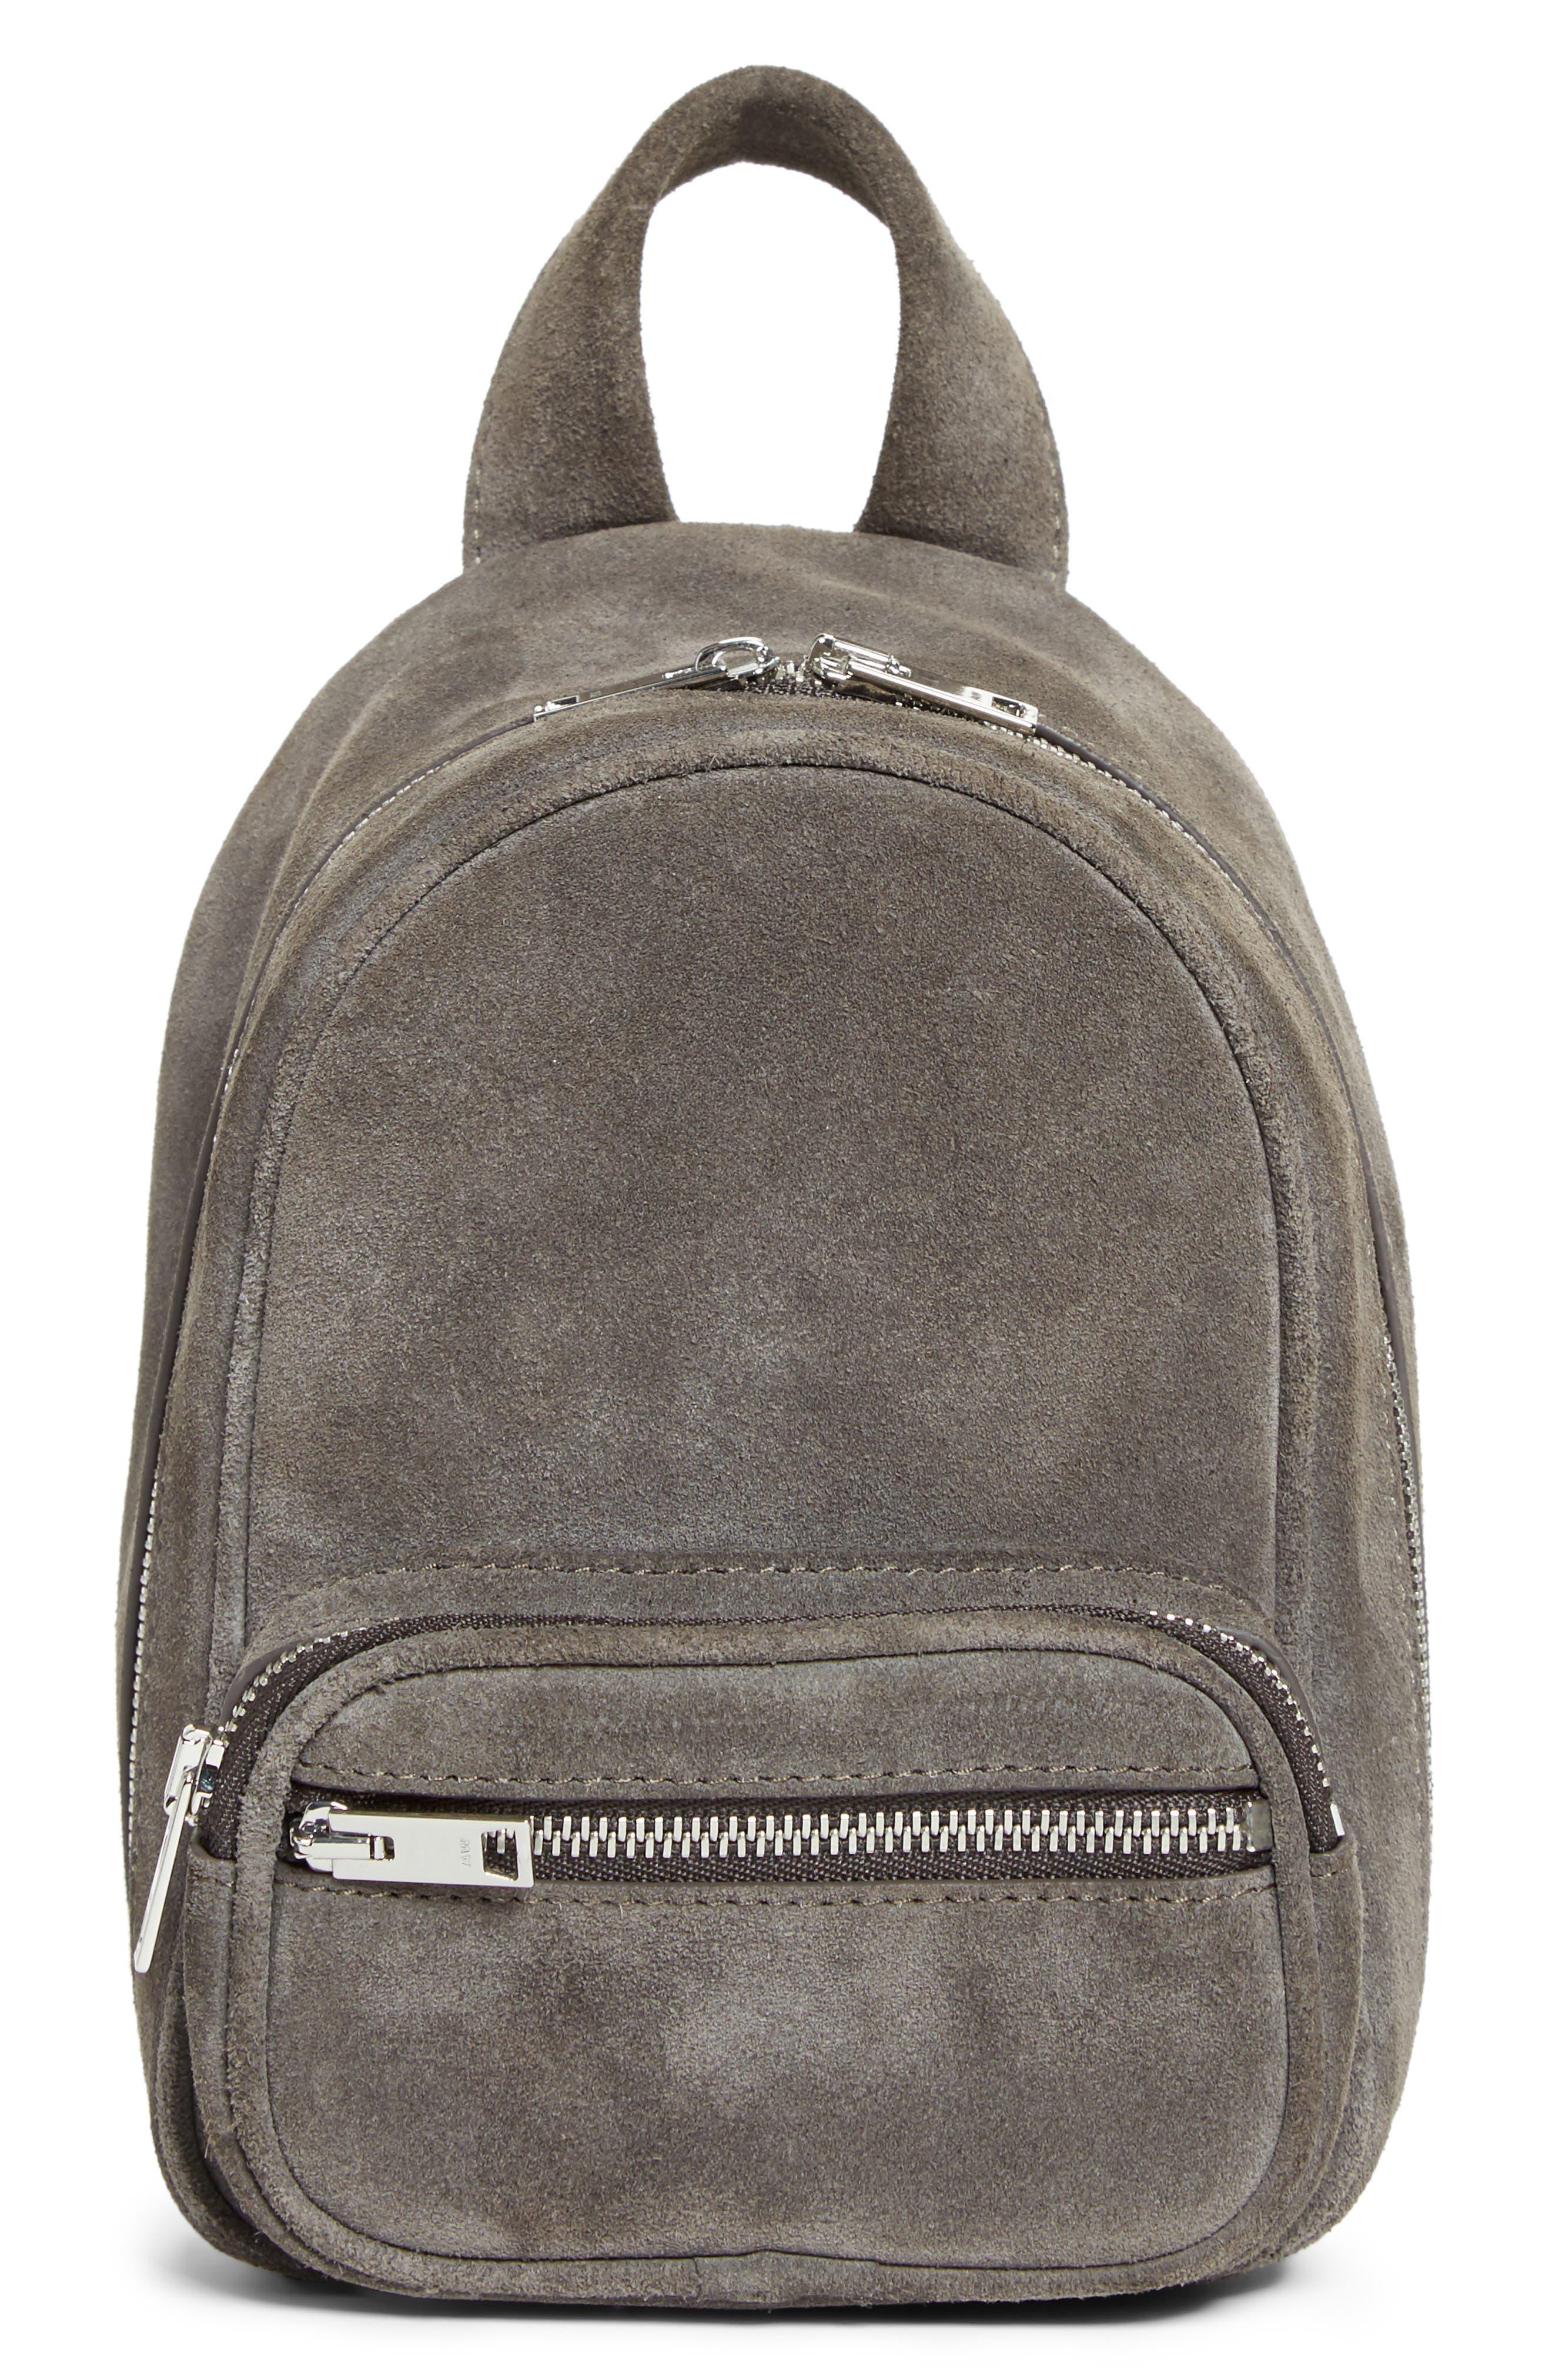 Alternate Image 1 Selected - Alexander Wang Mini Attica Leather Crossbody Backpack